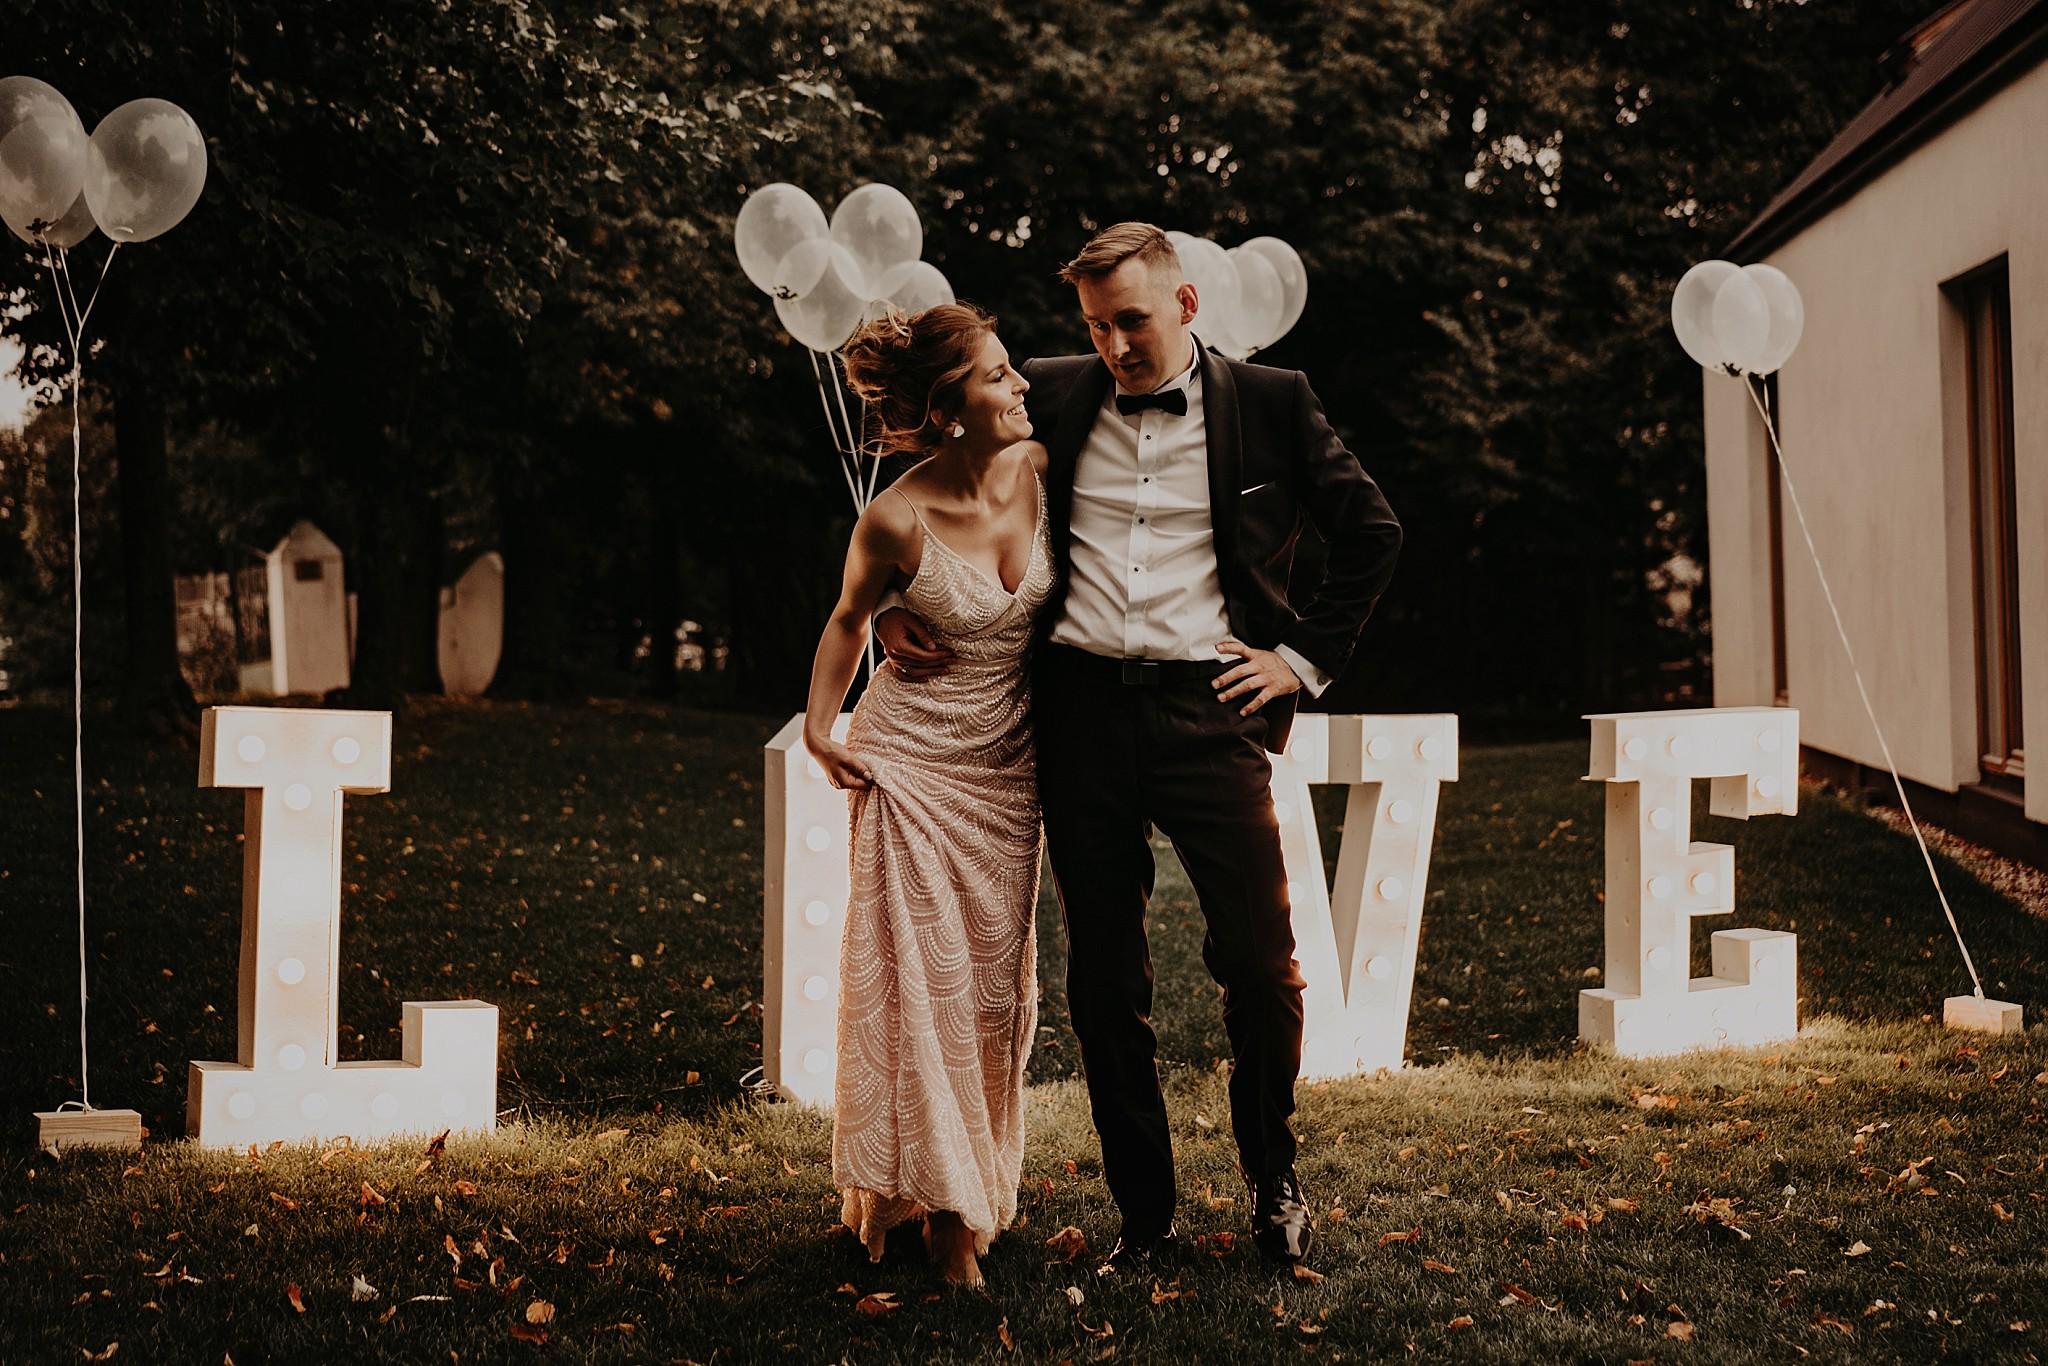 fotograf poznan wesele dobra truskawka piekne wesele pod poznaniem wesele w dobrej truskawce piekna para mloda slub marzen slub koronawirus slub listopad wesele koronawirus 354